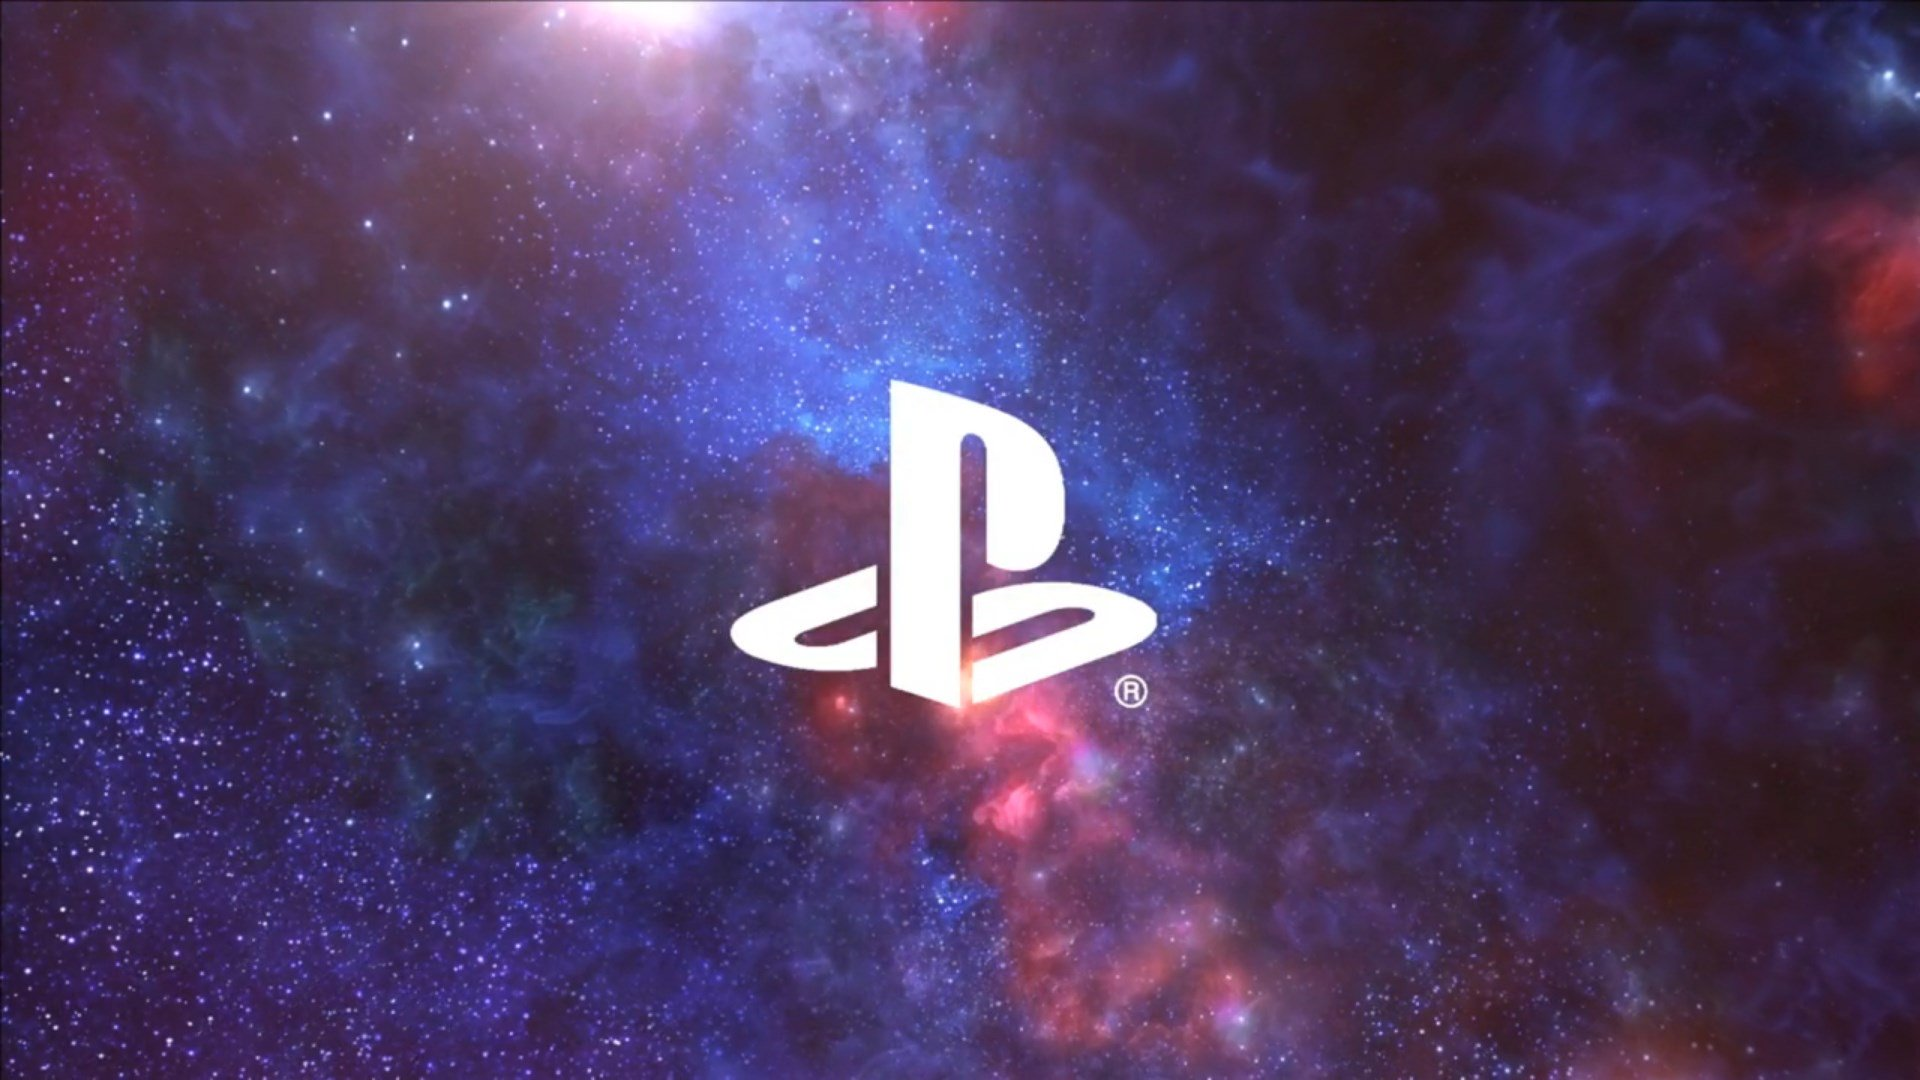 PlayStation-Logo-pc-games.jpg